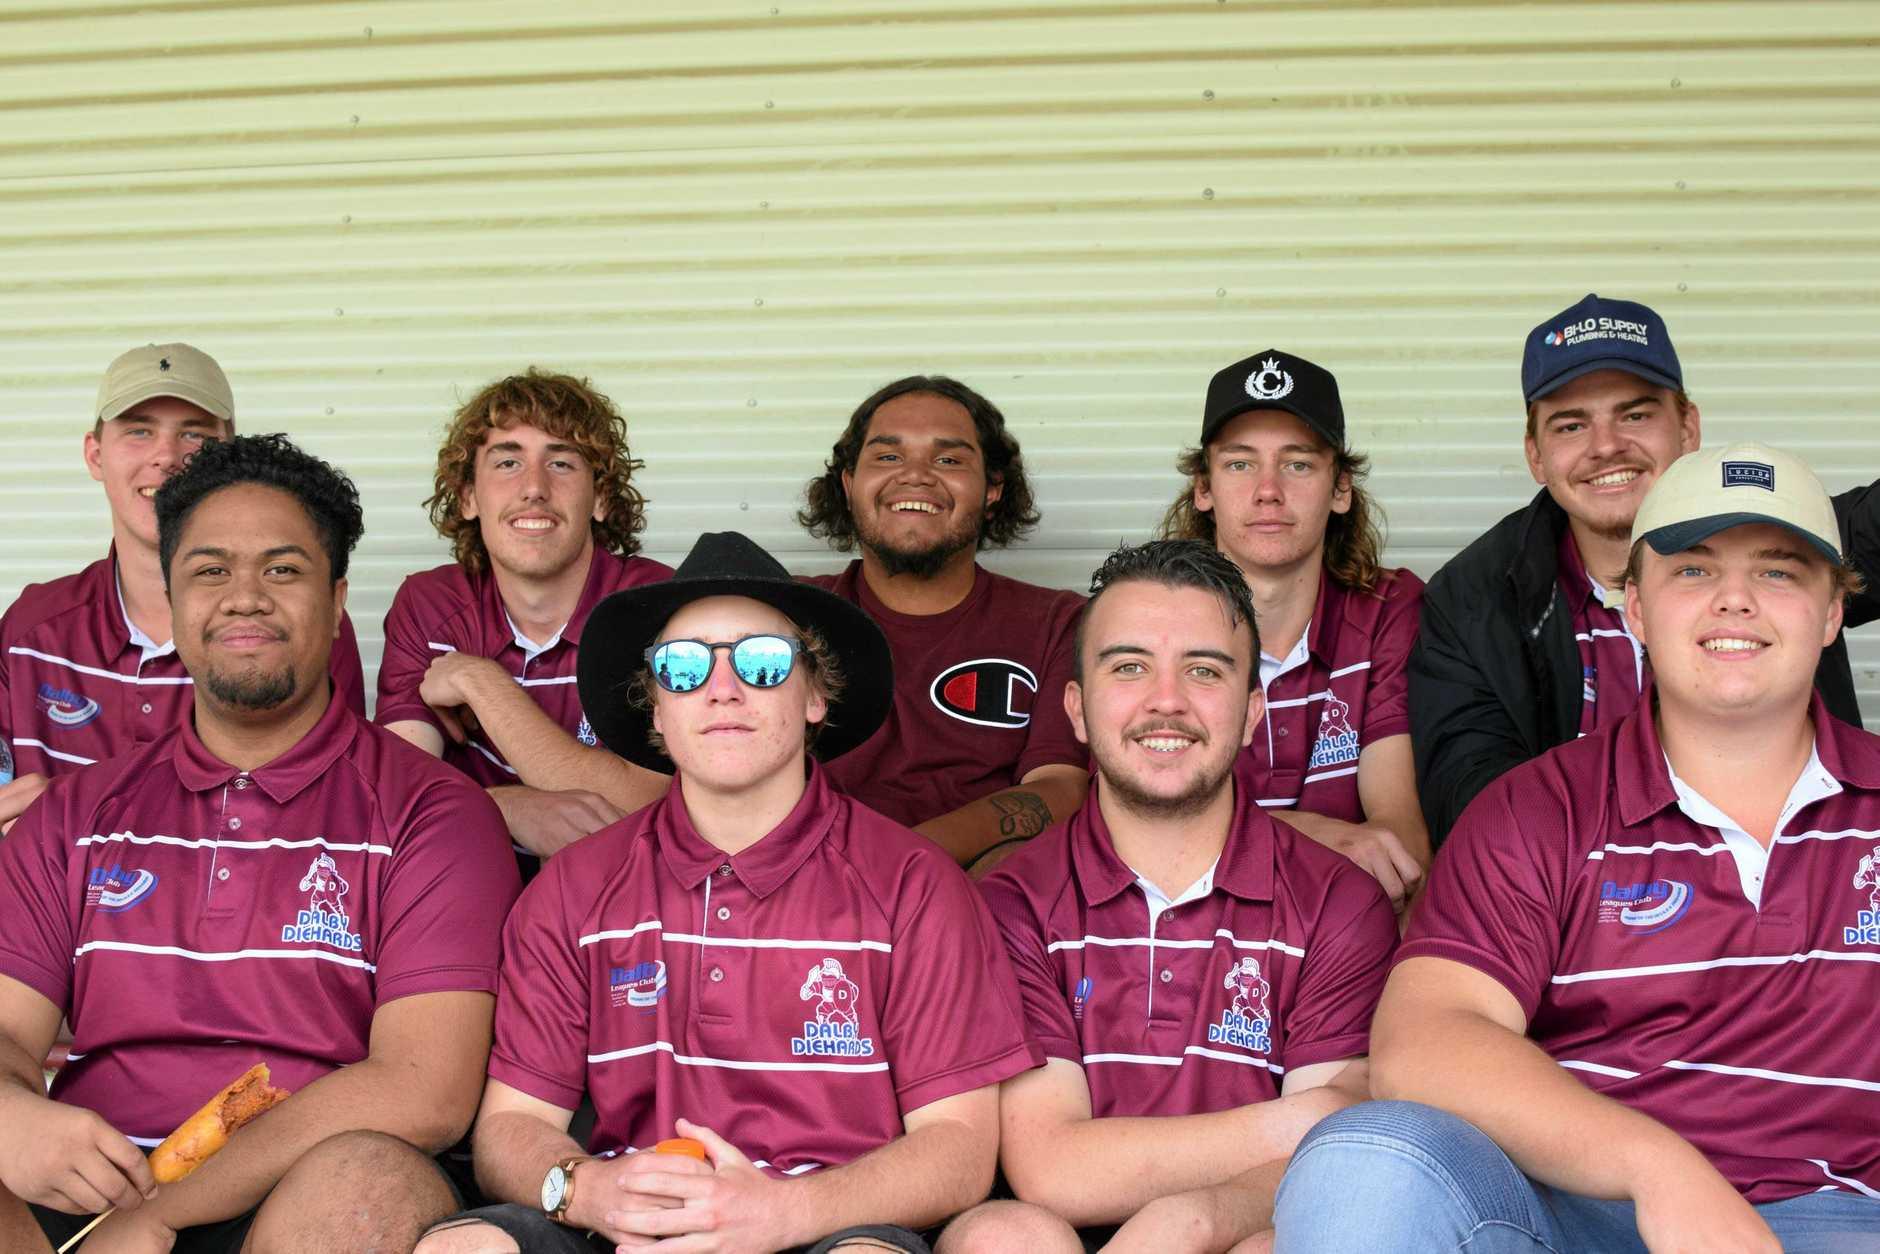 (Back) Blake Hunter, Corey Salter, Tyson Beezley, Brian Babington and James Heinrich. (Front) David Rongo, Tim Sheehan, Jake McCarthy and Noah Brady